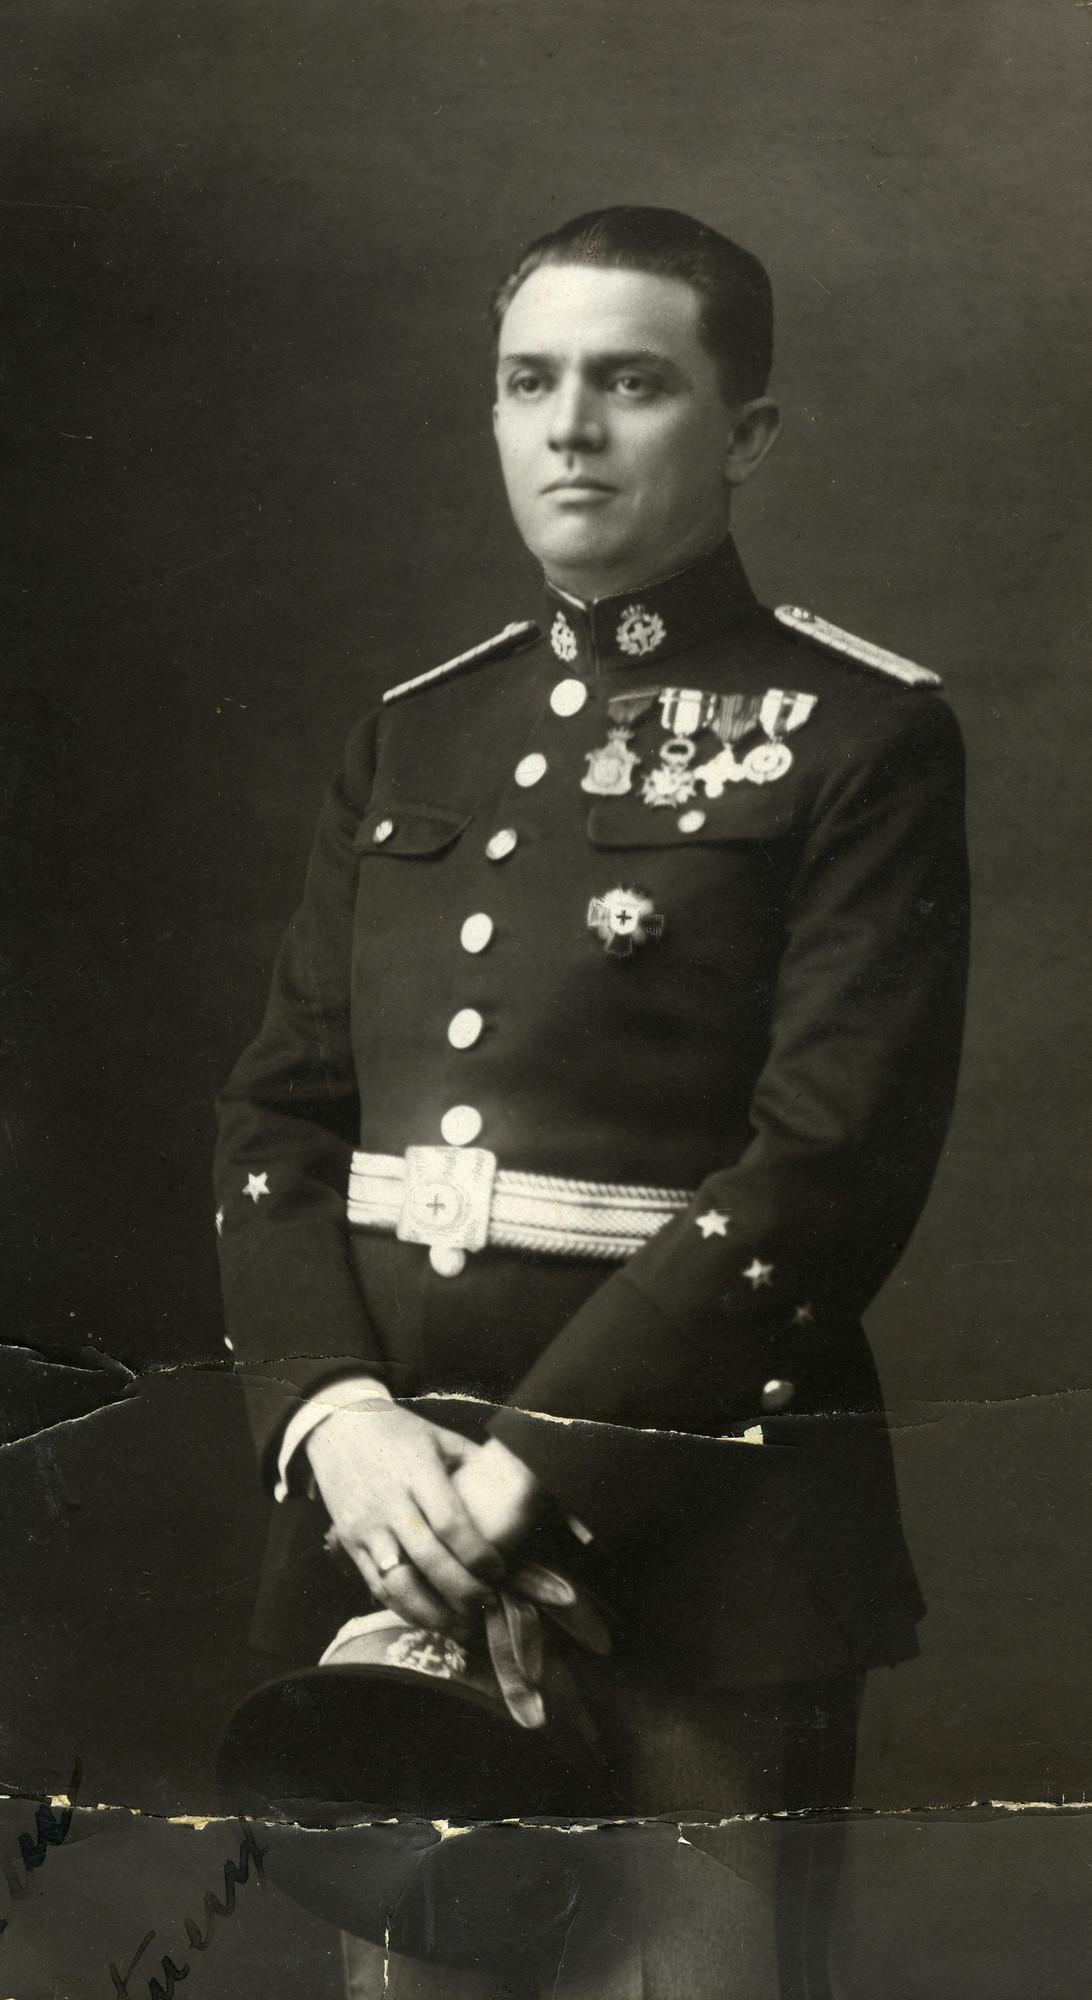 Portrait of Vice Consul Salomon Ezratty.  Salomon was the brother of Haim Ezratty, Jenny's father.